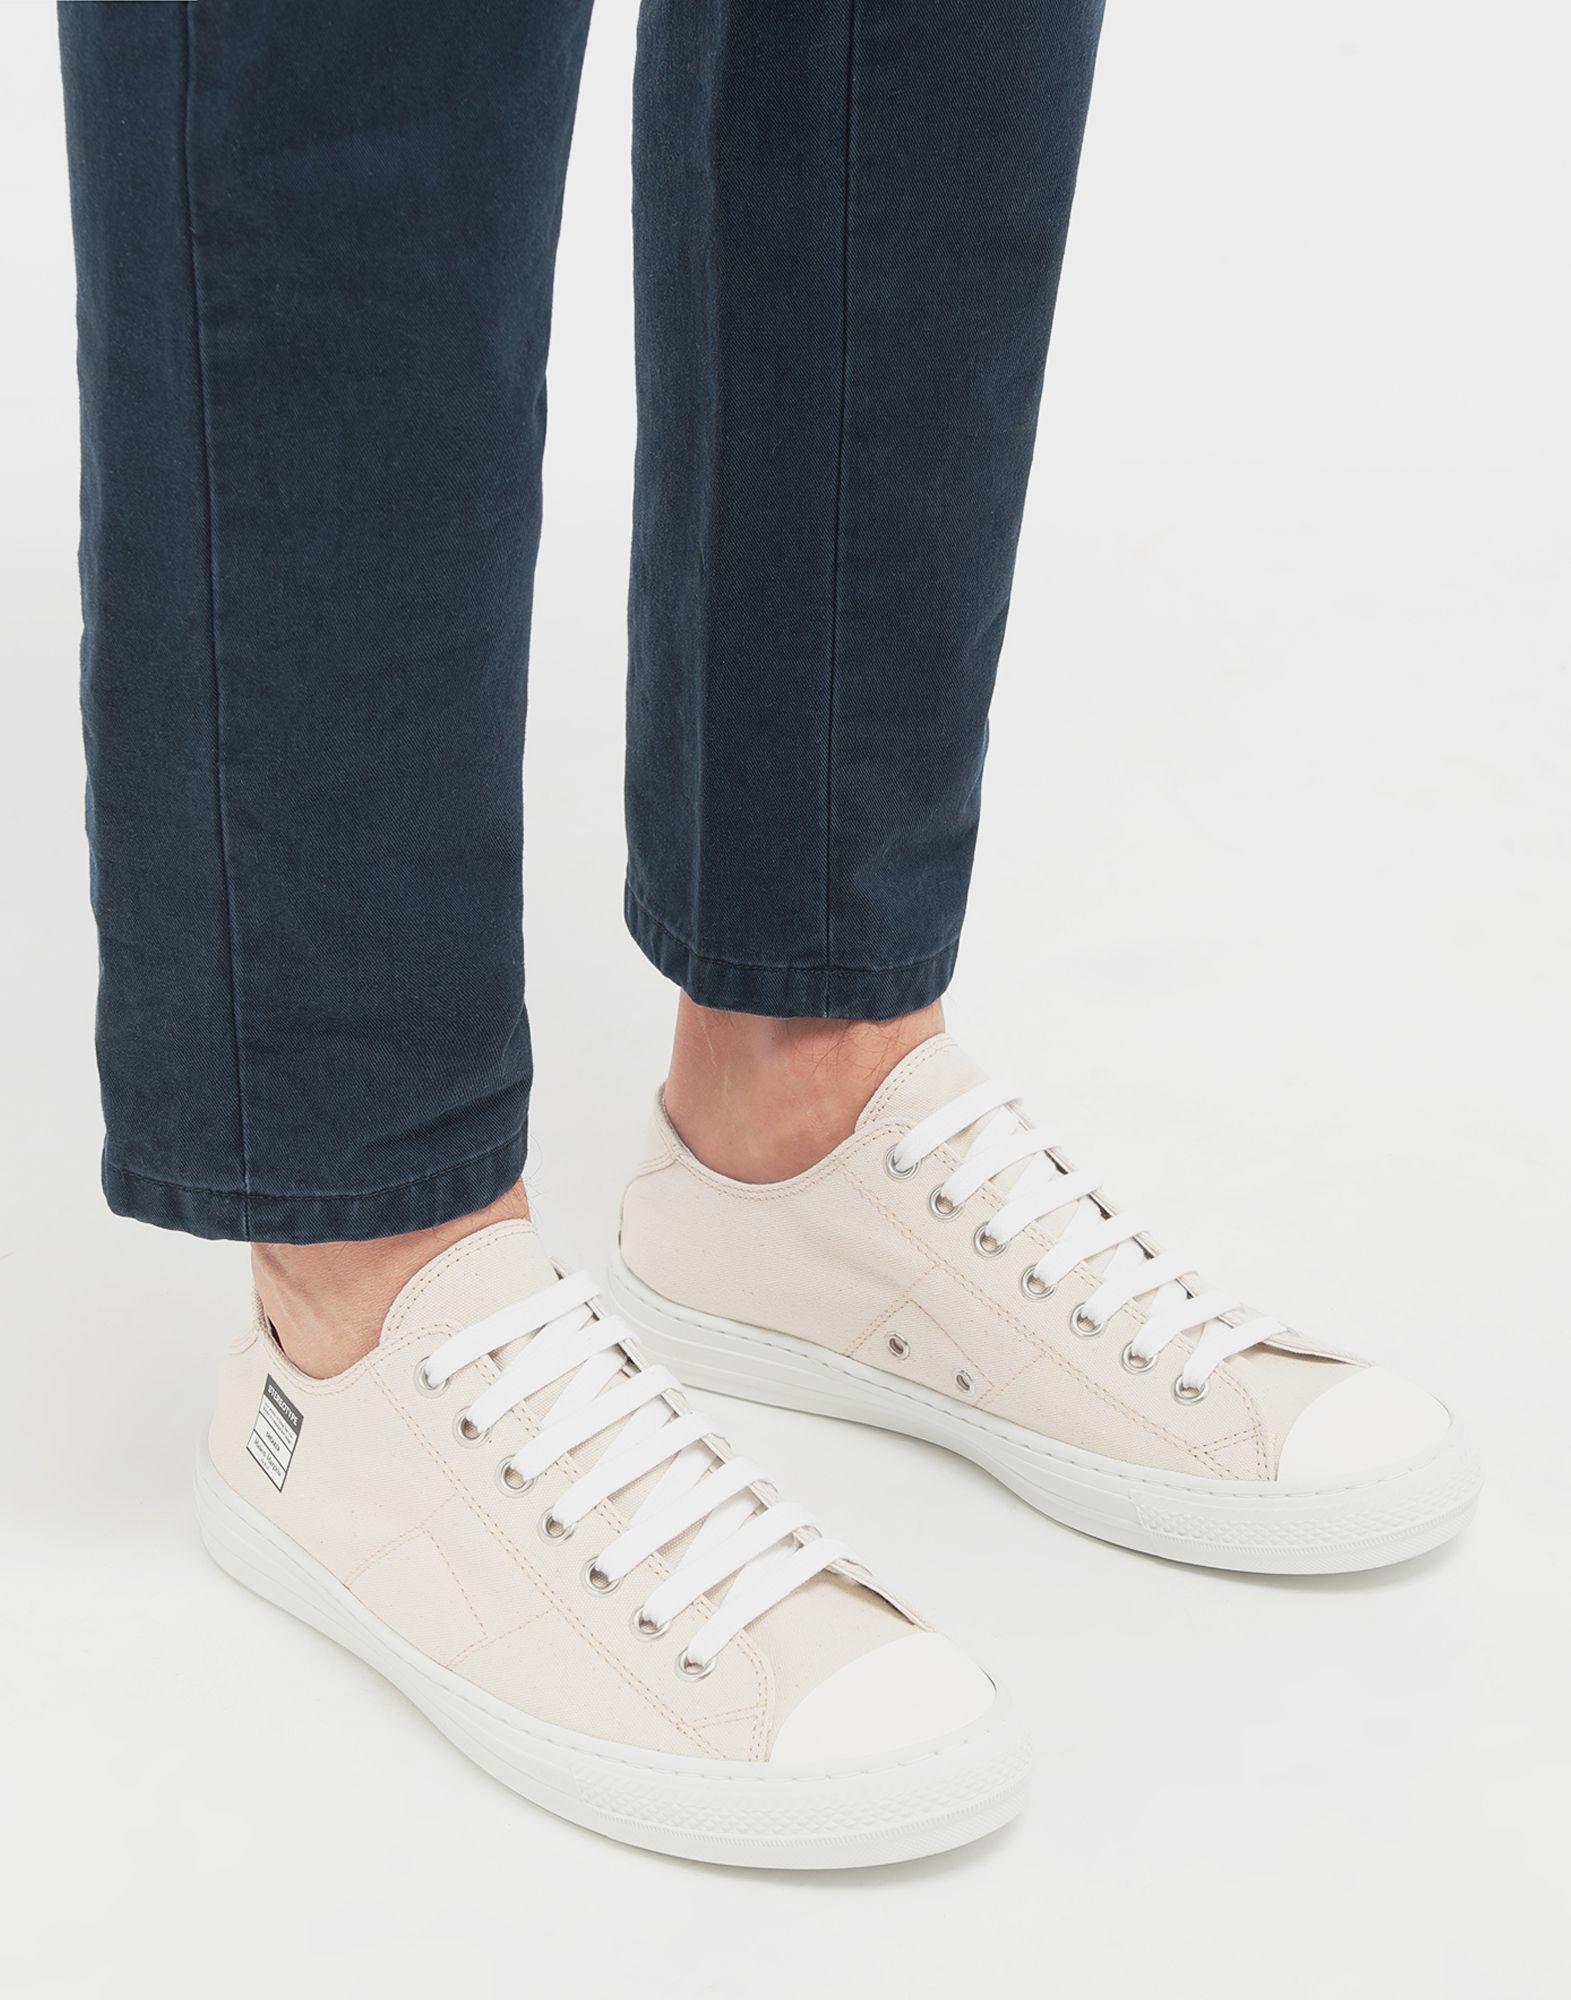 MAISON MARGIELA Low-Top-Sneakers Stereotype Sneakers Herren b